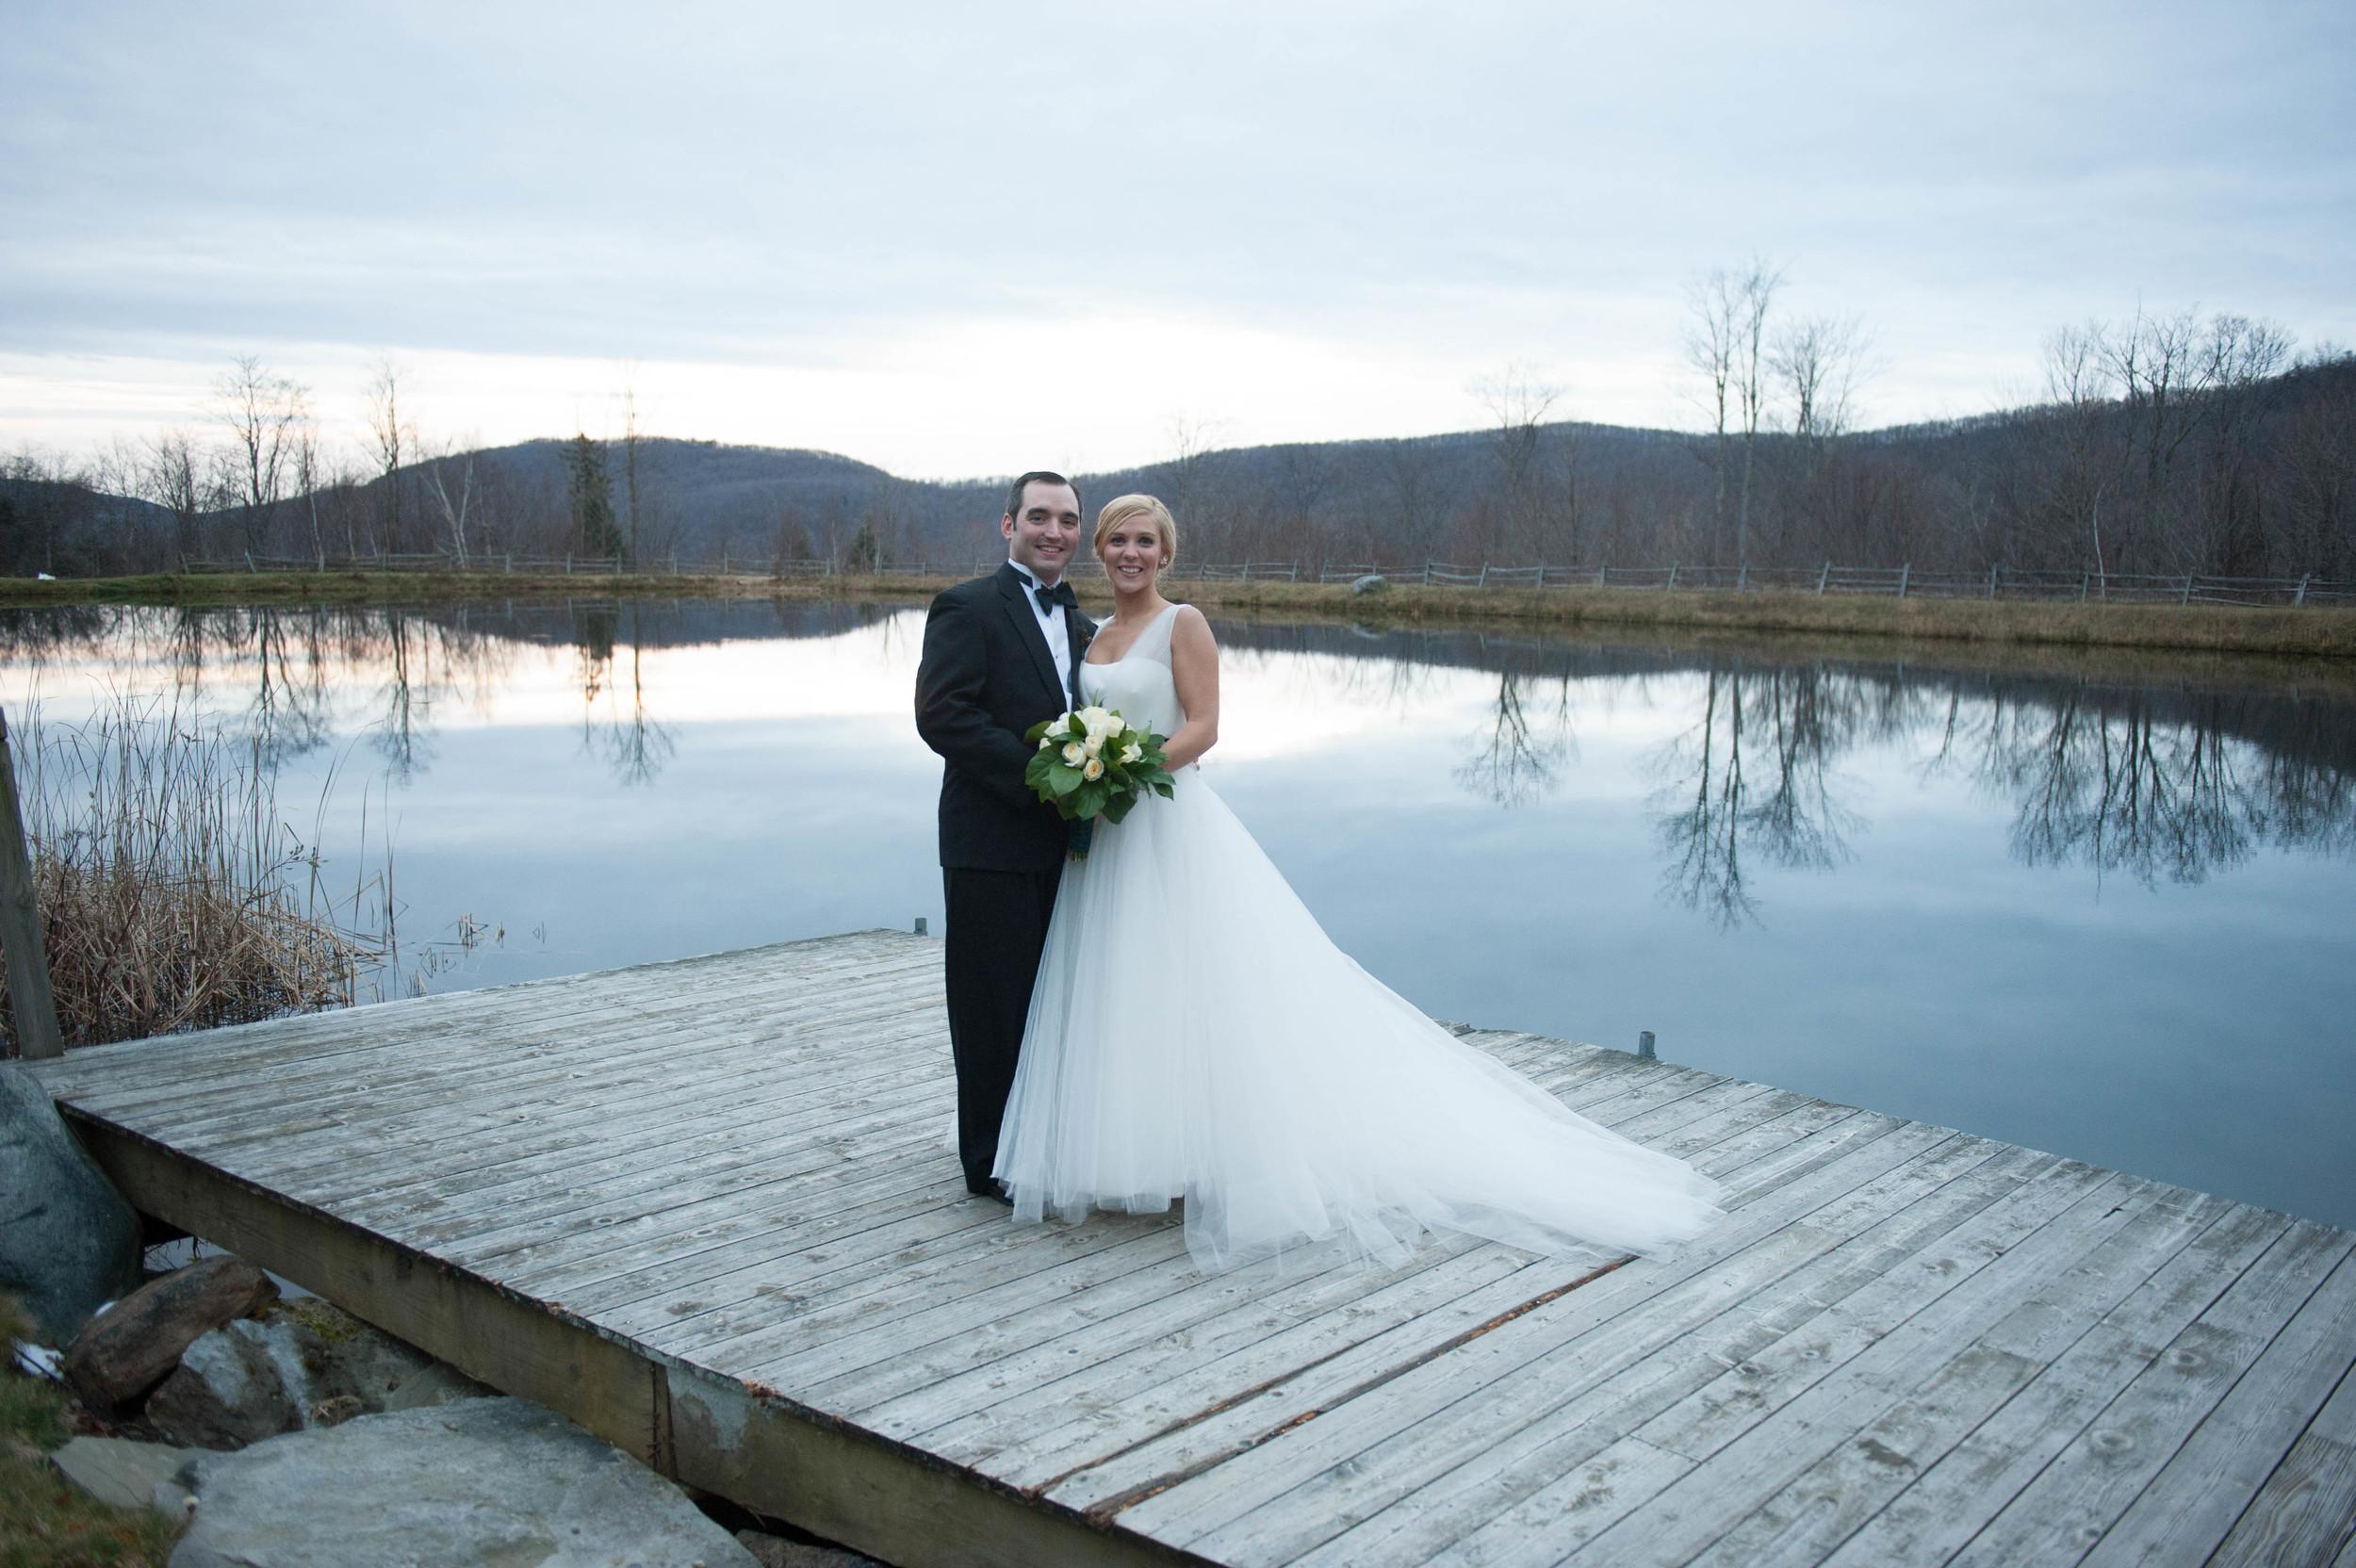 The_Ponds_Vermont_Wedding_Photo-70.jpg